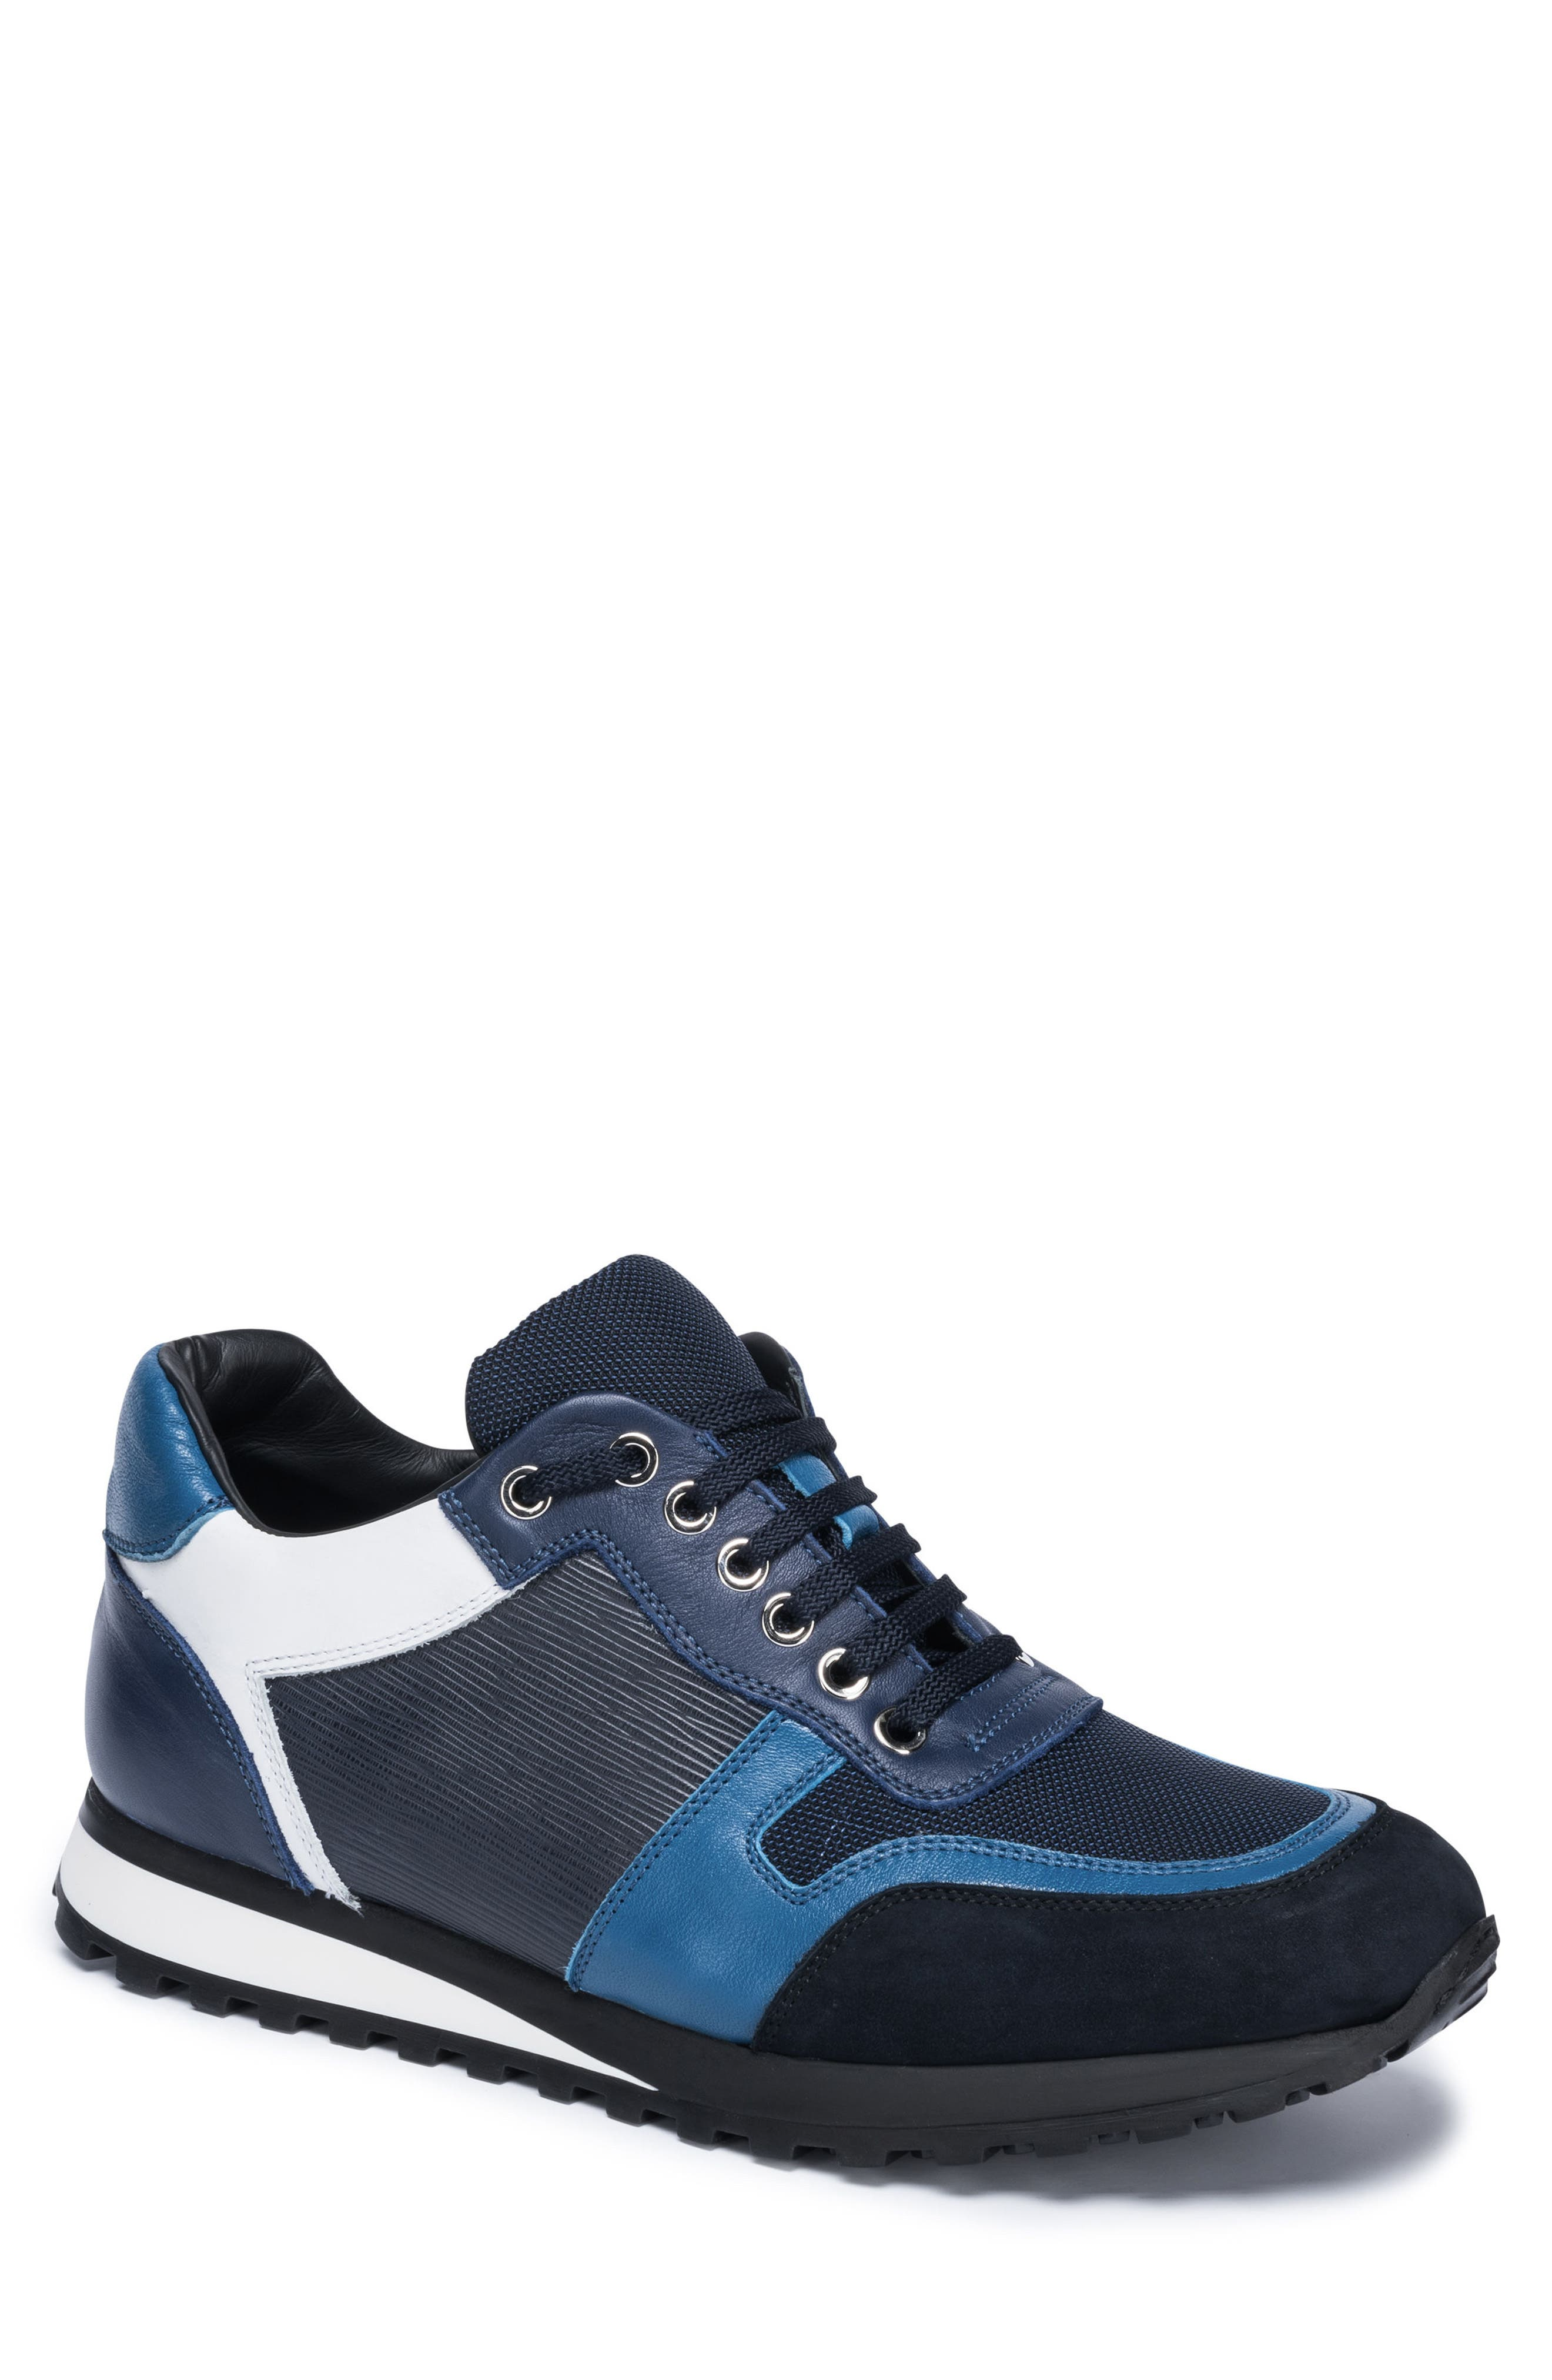 Modena Sneaker,                             Main thumbnail 1, color,                             Blue